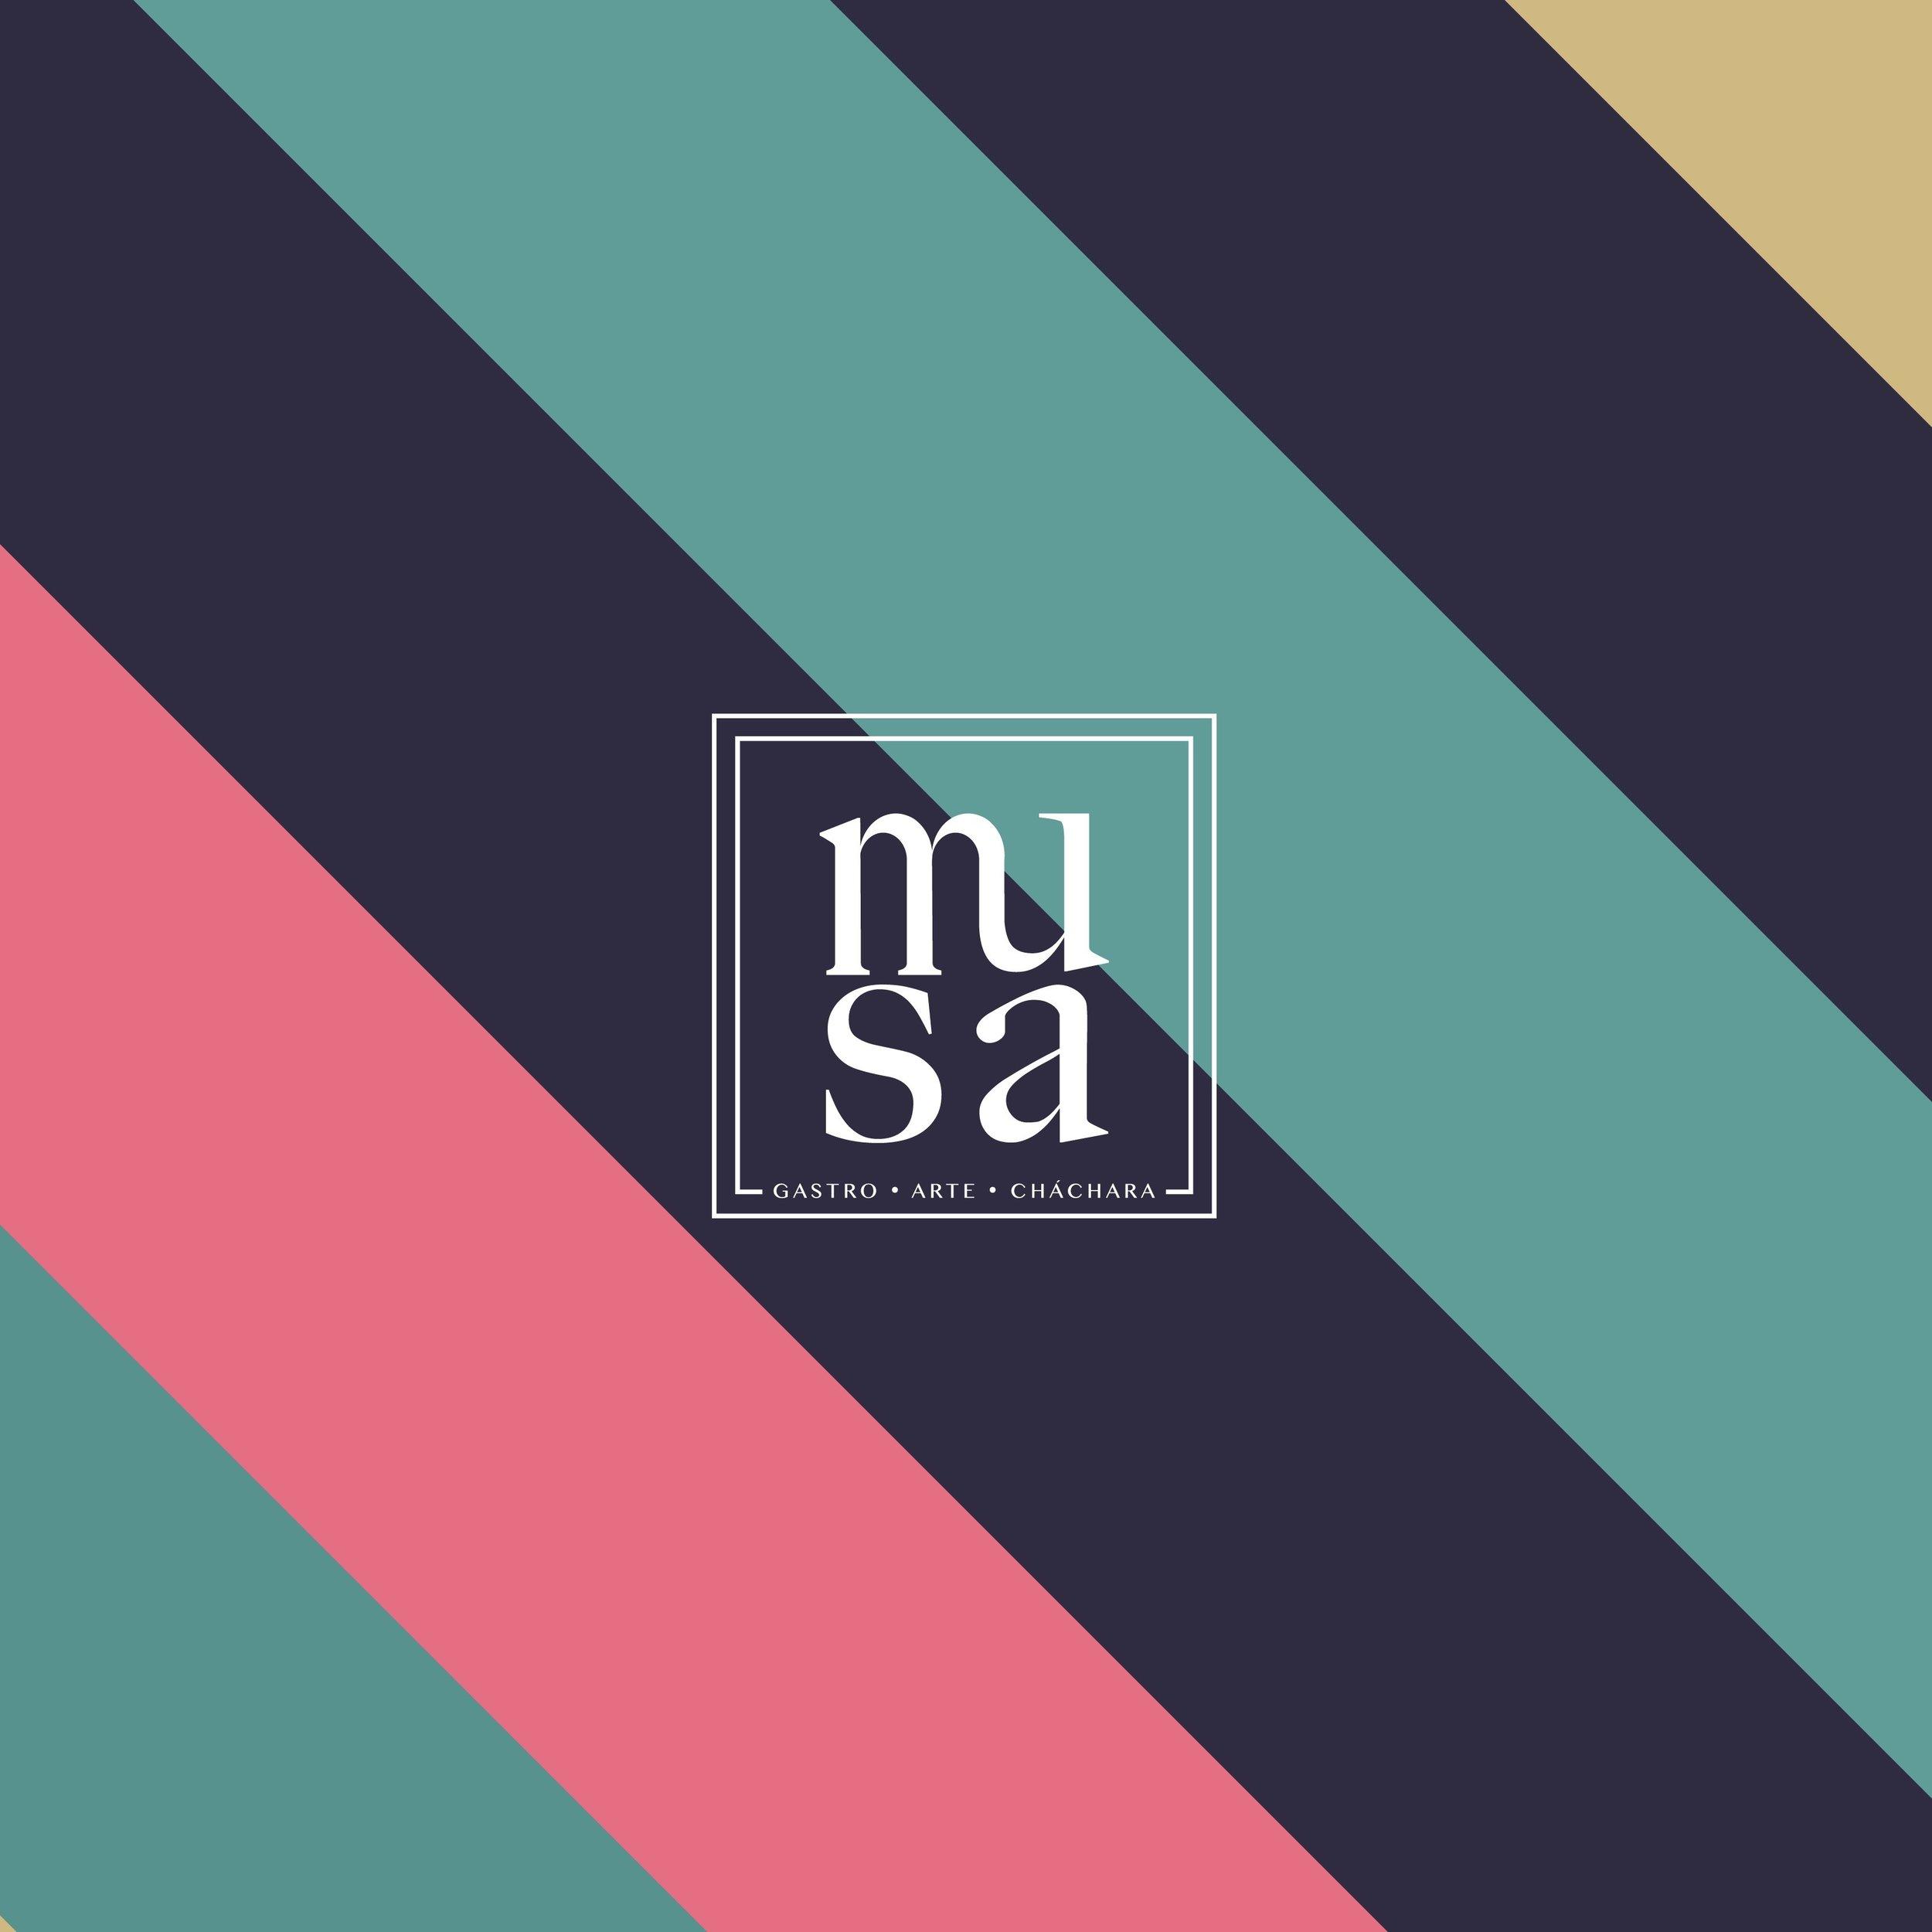 MUSA logo.jpg